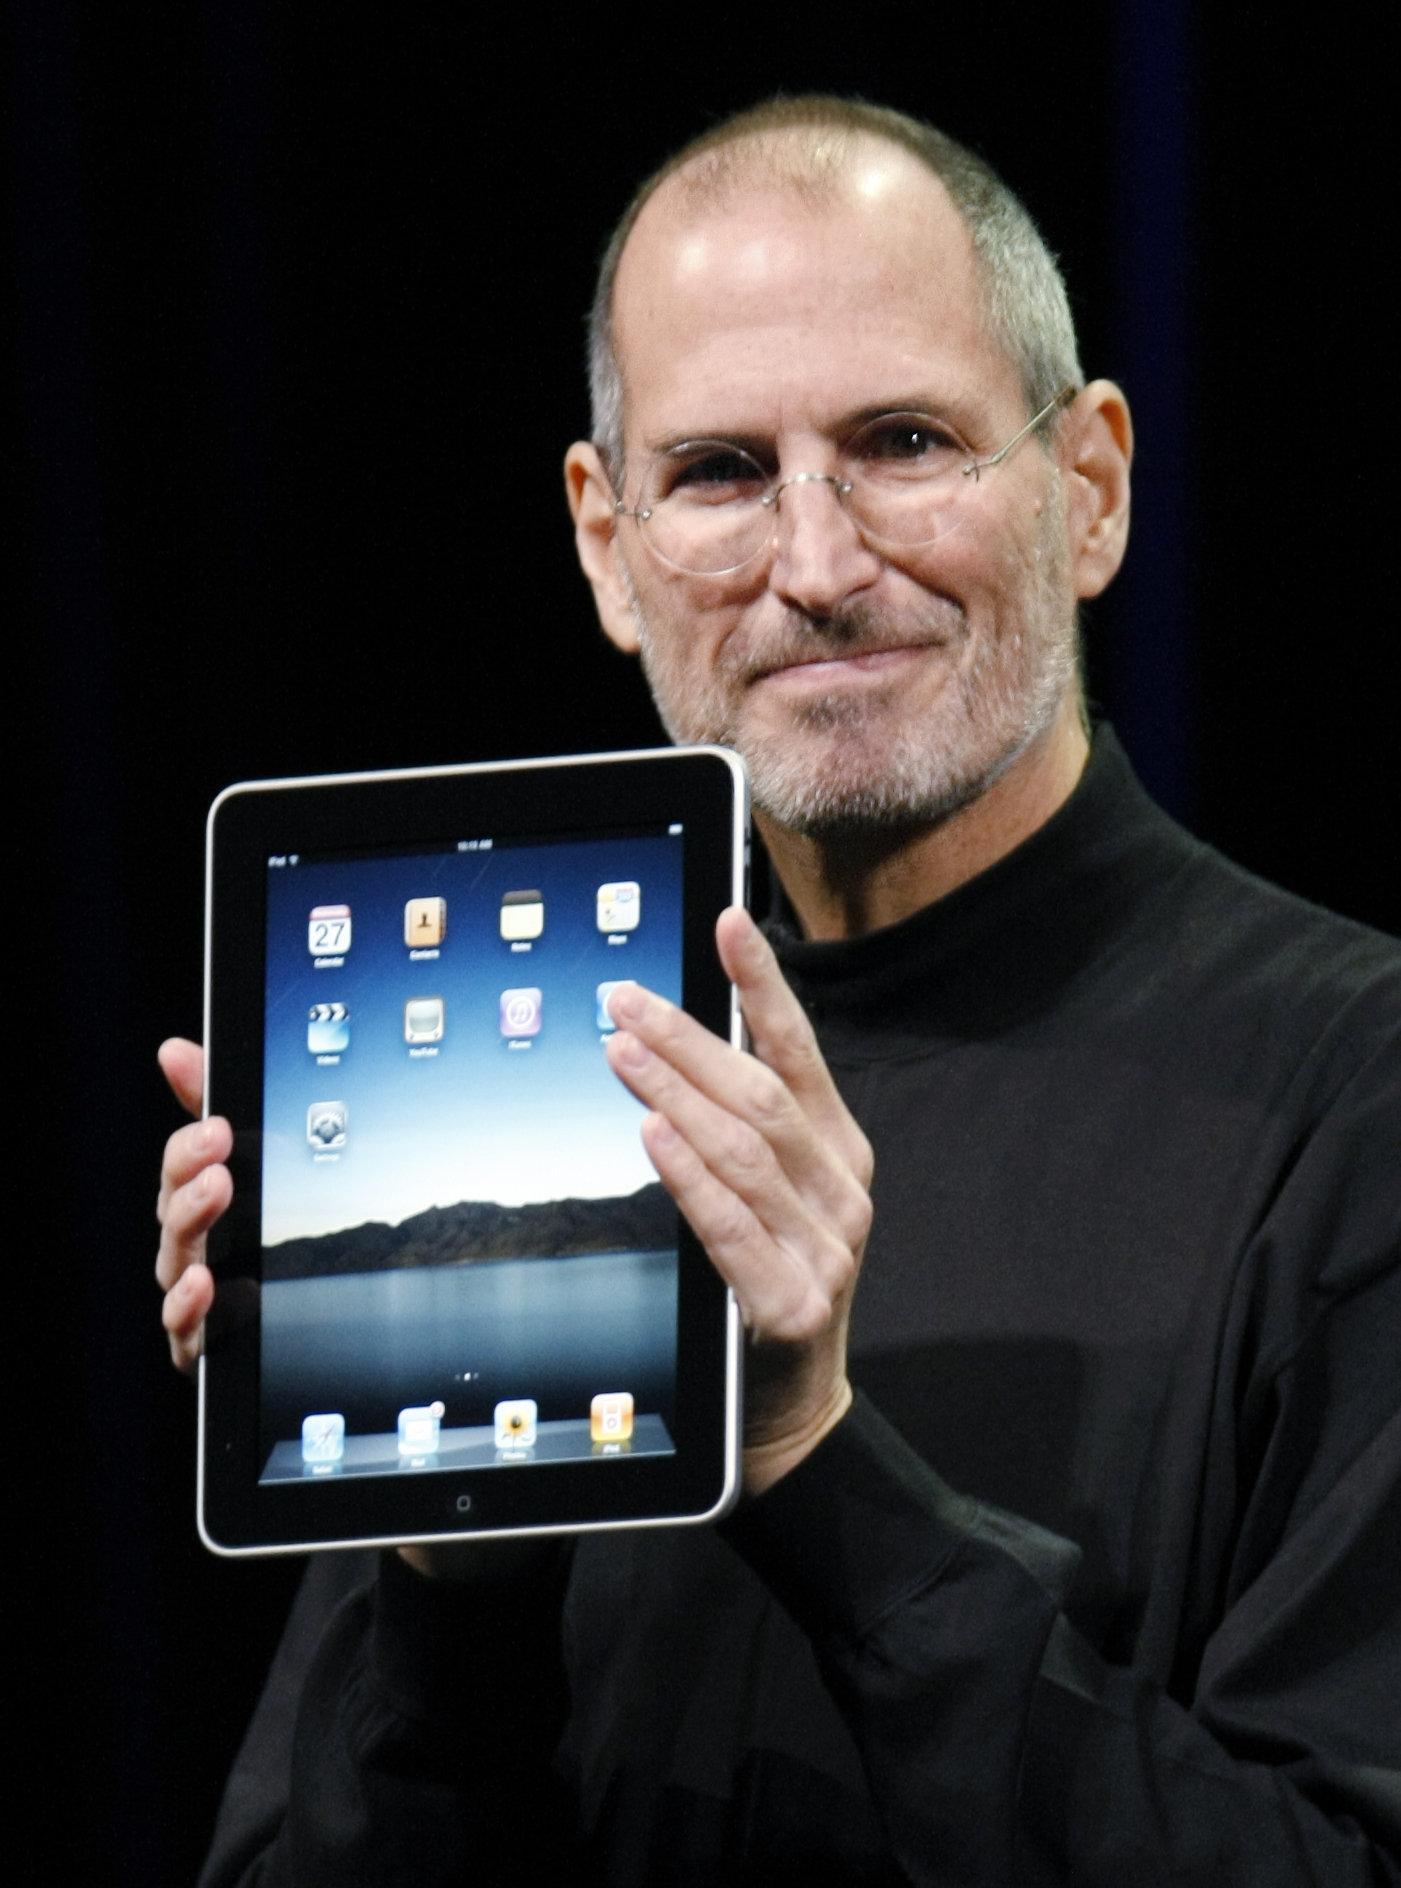 Former CEO of Apple Computers, Steve Jobs